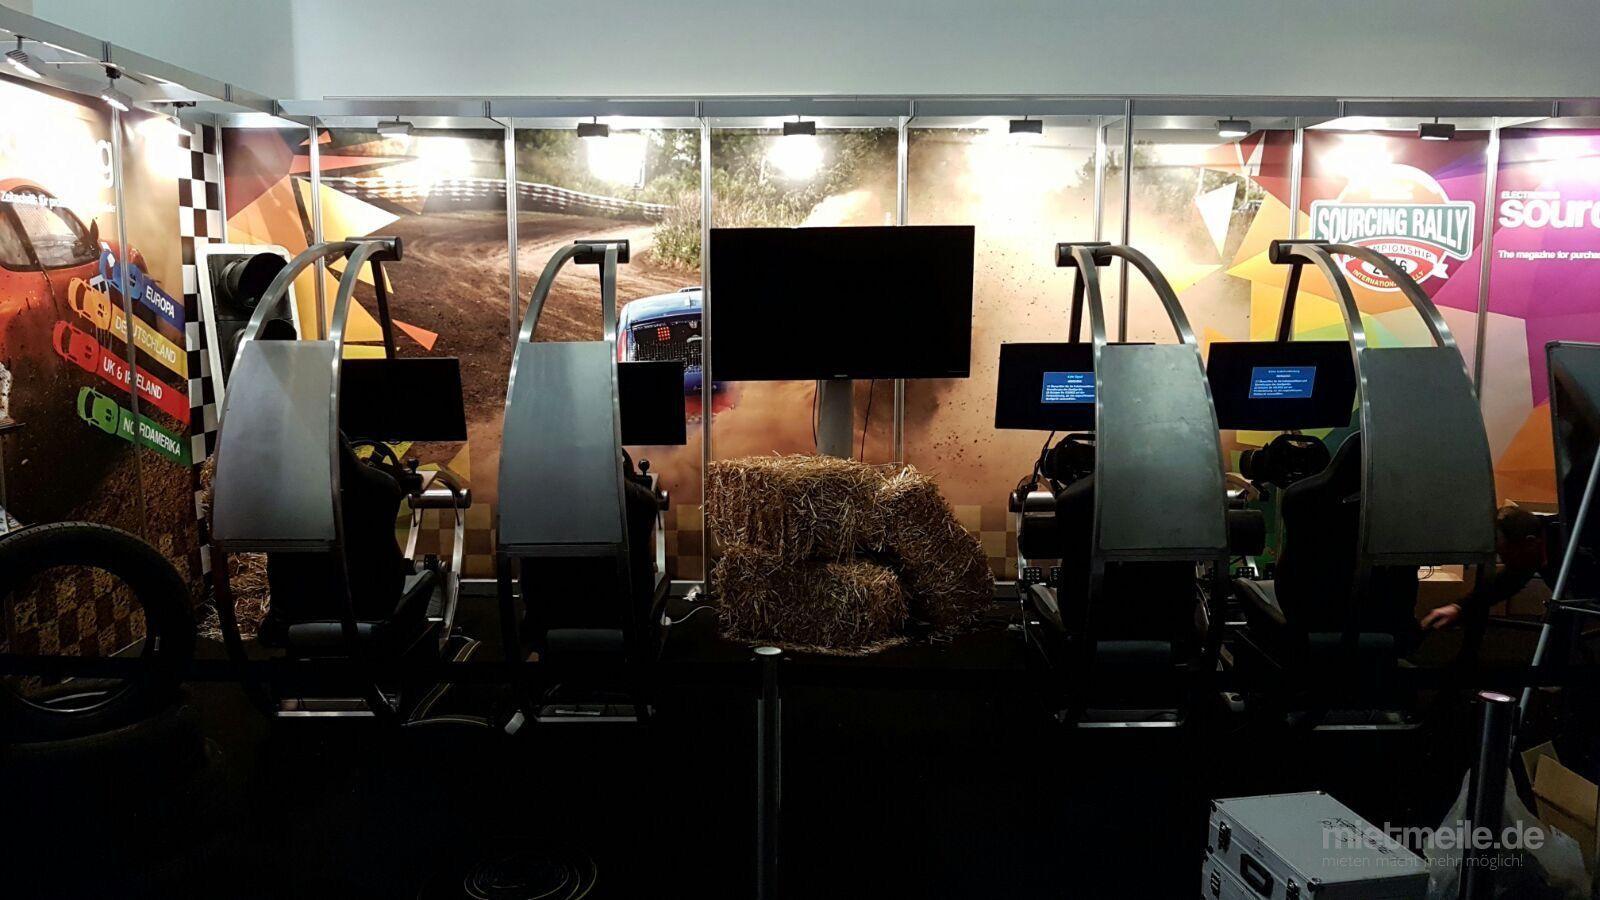 Simulatoren mieten & vermieten - Truck Simulator, Truck Racing Simulator, Rennsimulator in Neukirchen-Vluyn